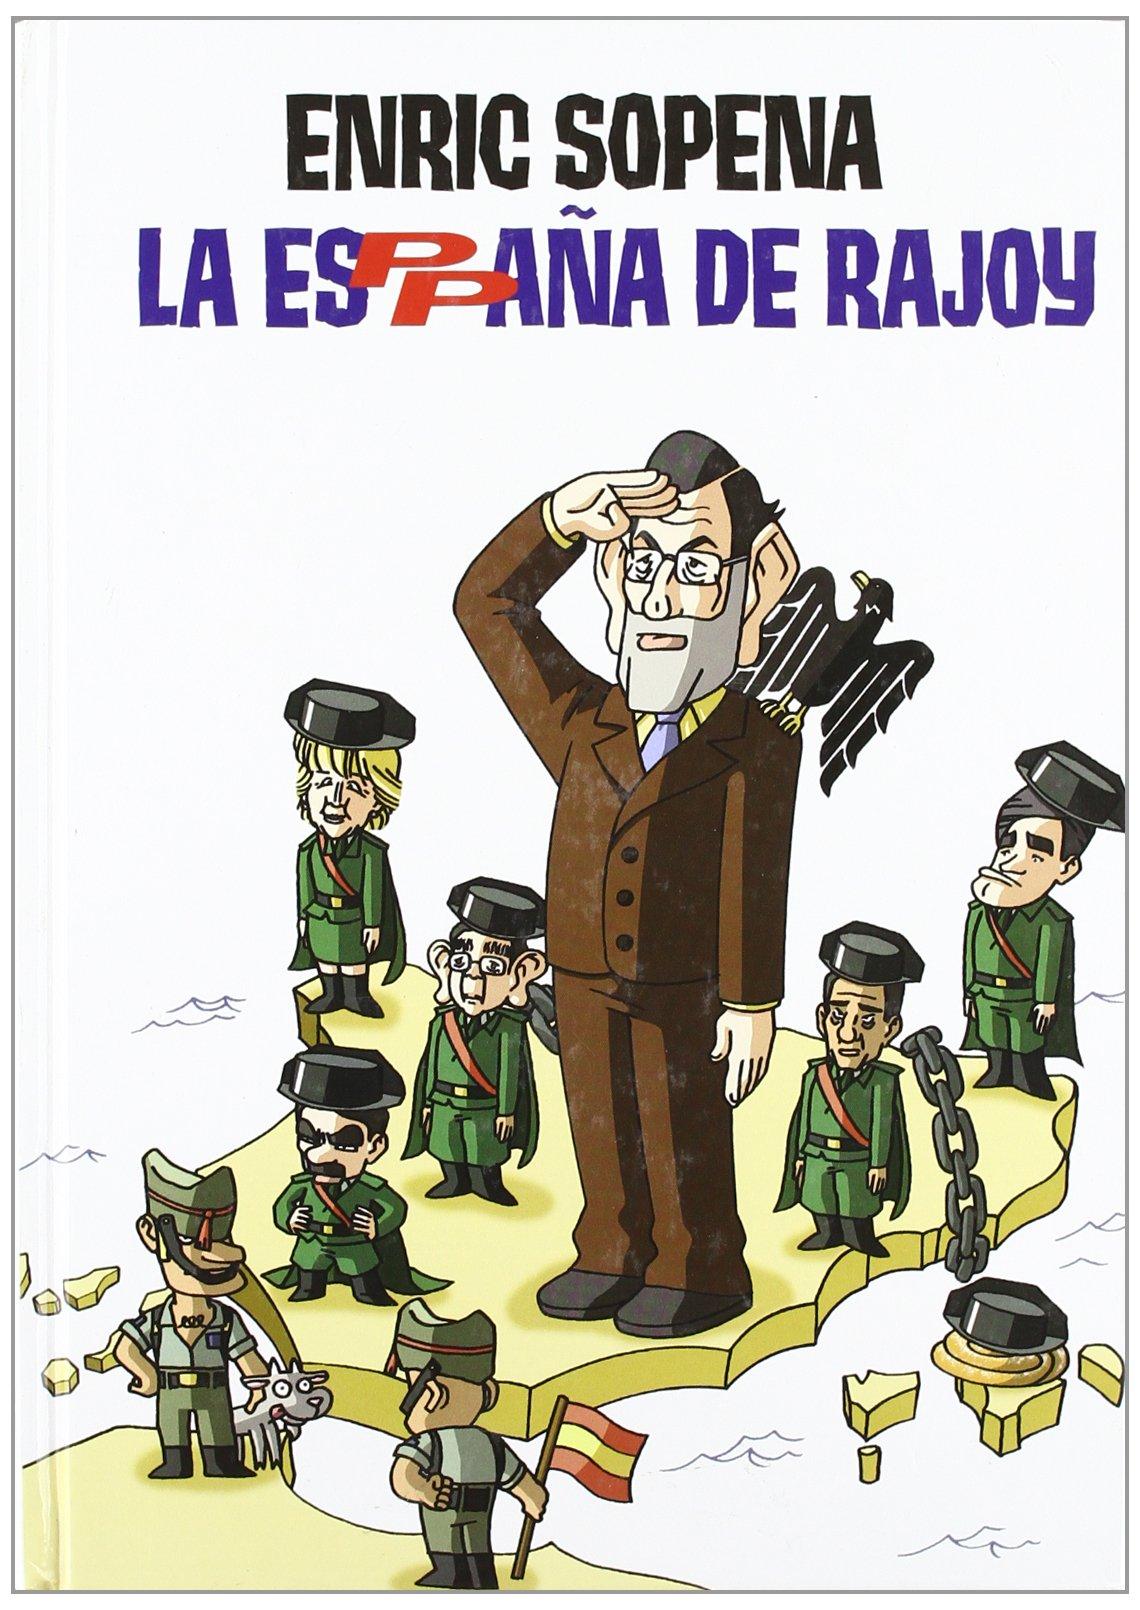 La España de Rajoy (COMIC BOOKS): Amazon.es: Sopena Daganzo, Enric: Libros